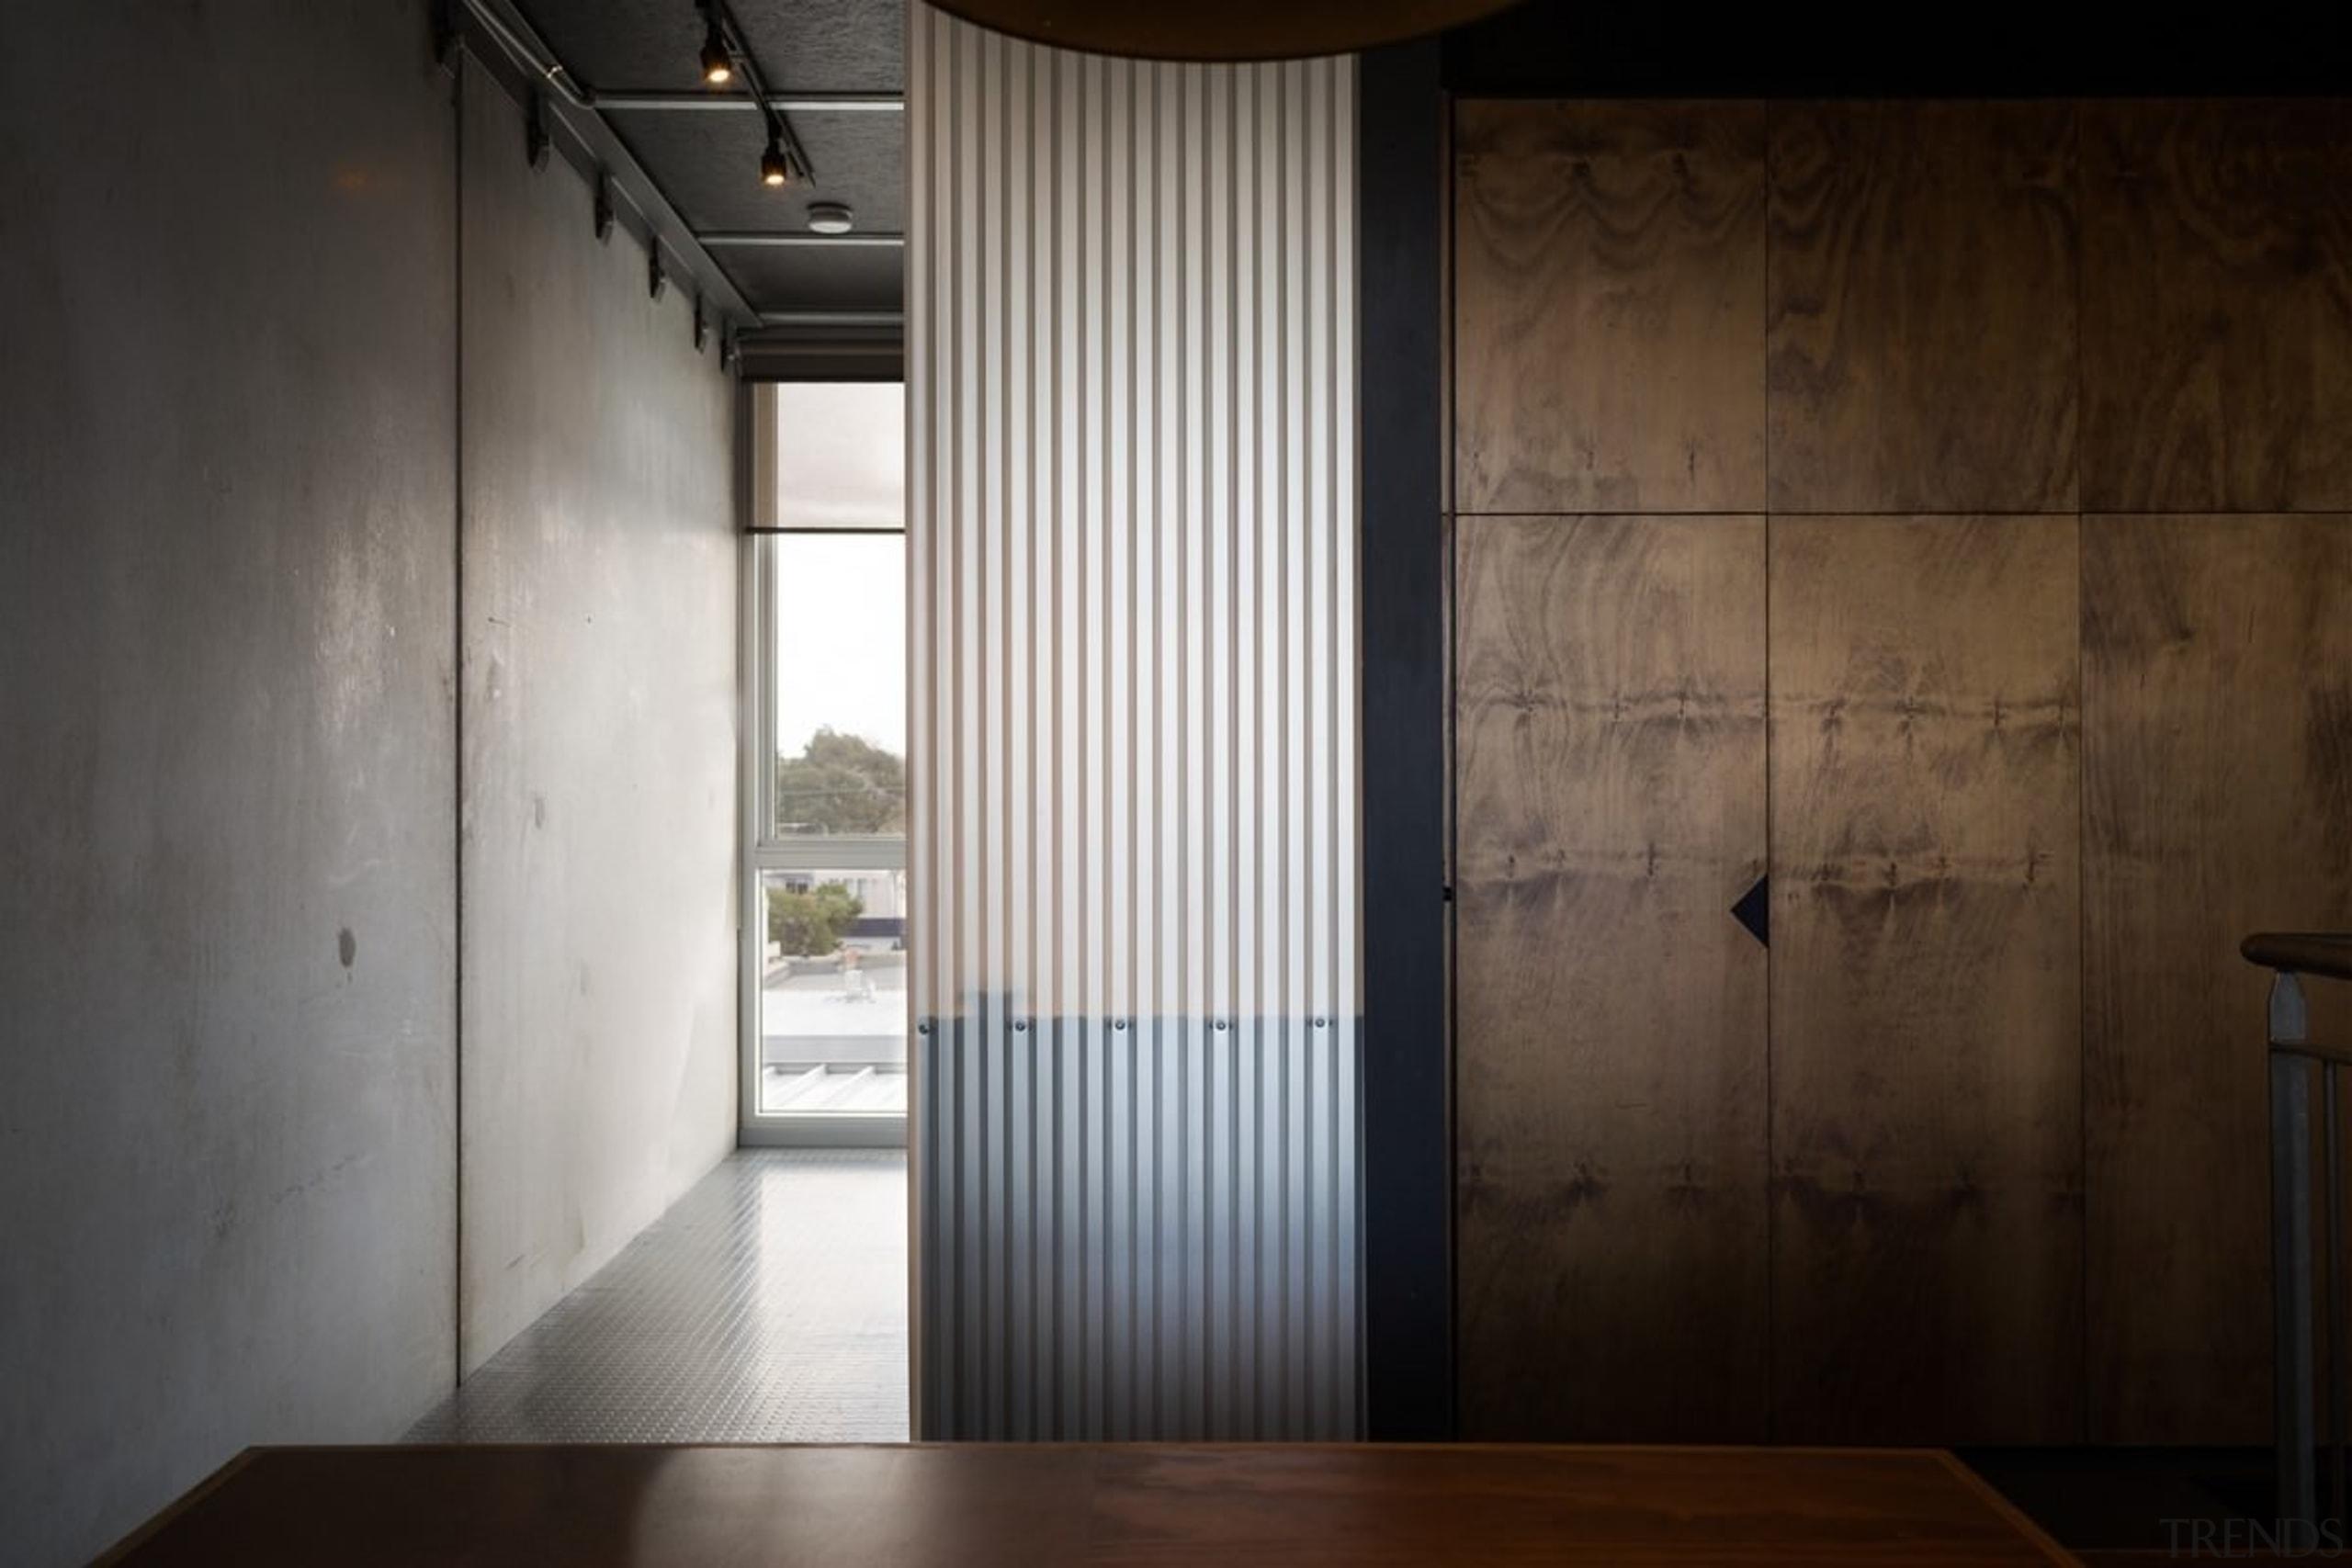 Norton Legal - Norton Legal - architecture | architecture, daylighting, door, floor, house, interior design, wall, window, wood, black